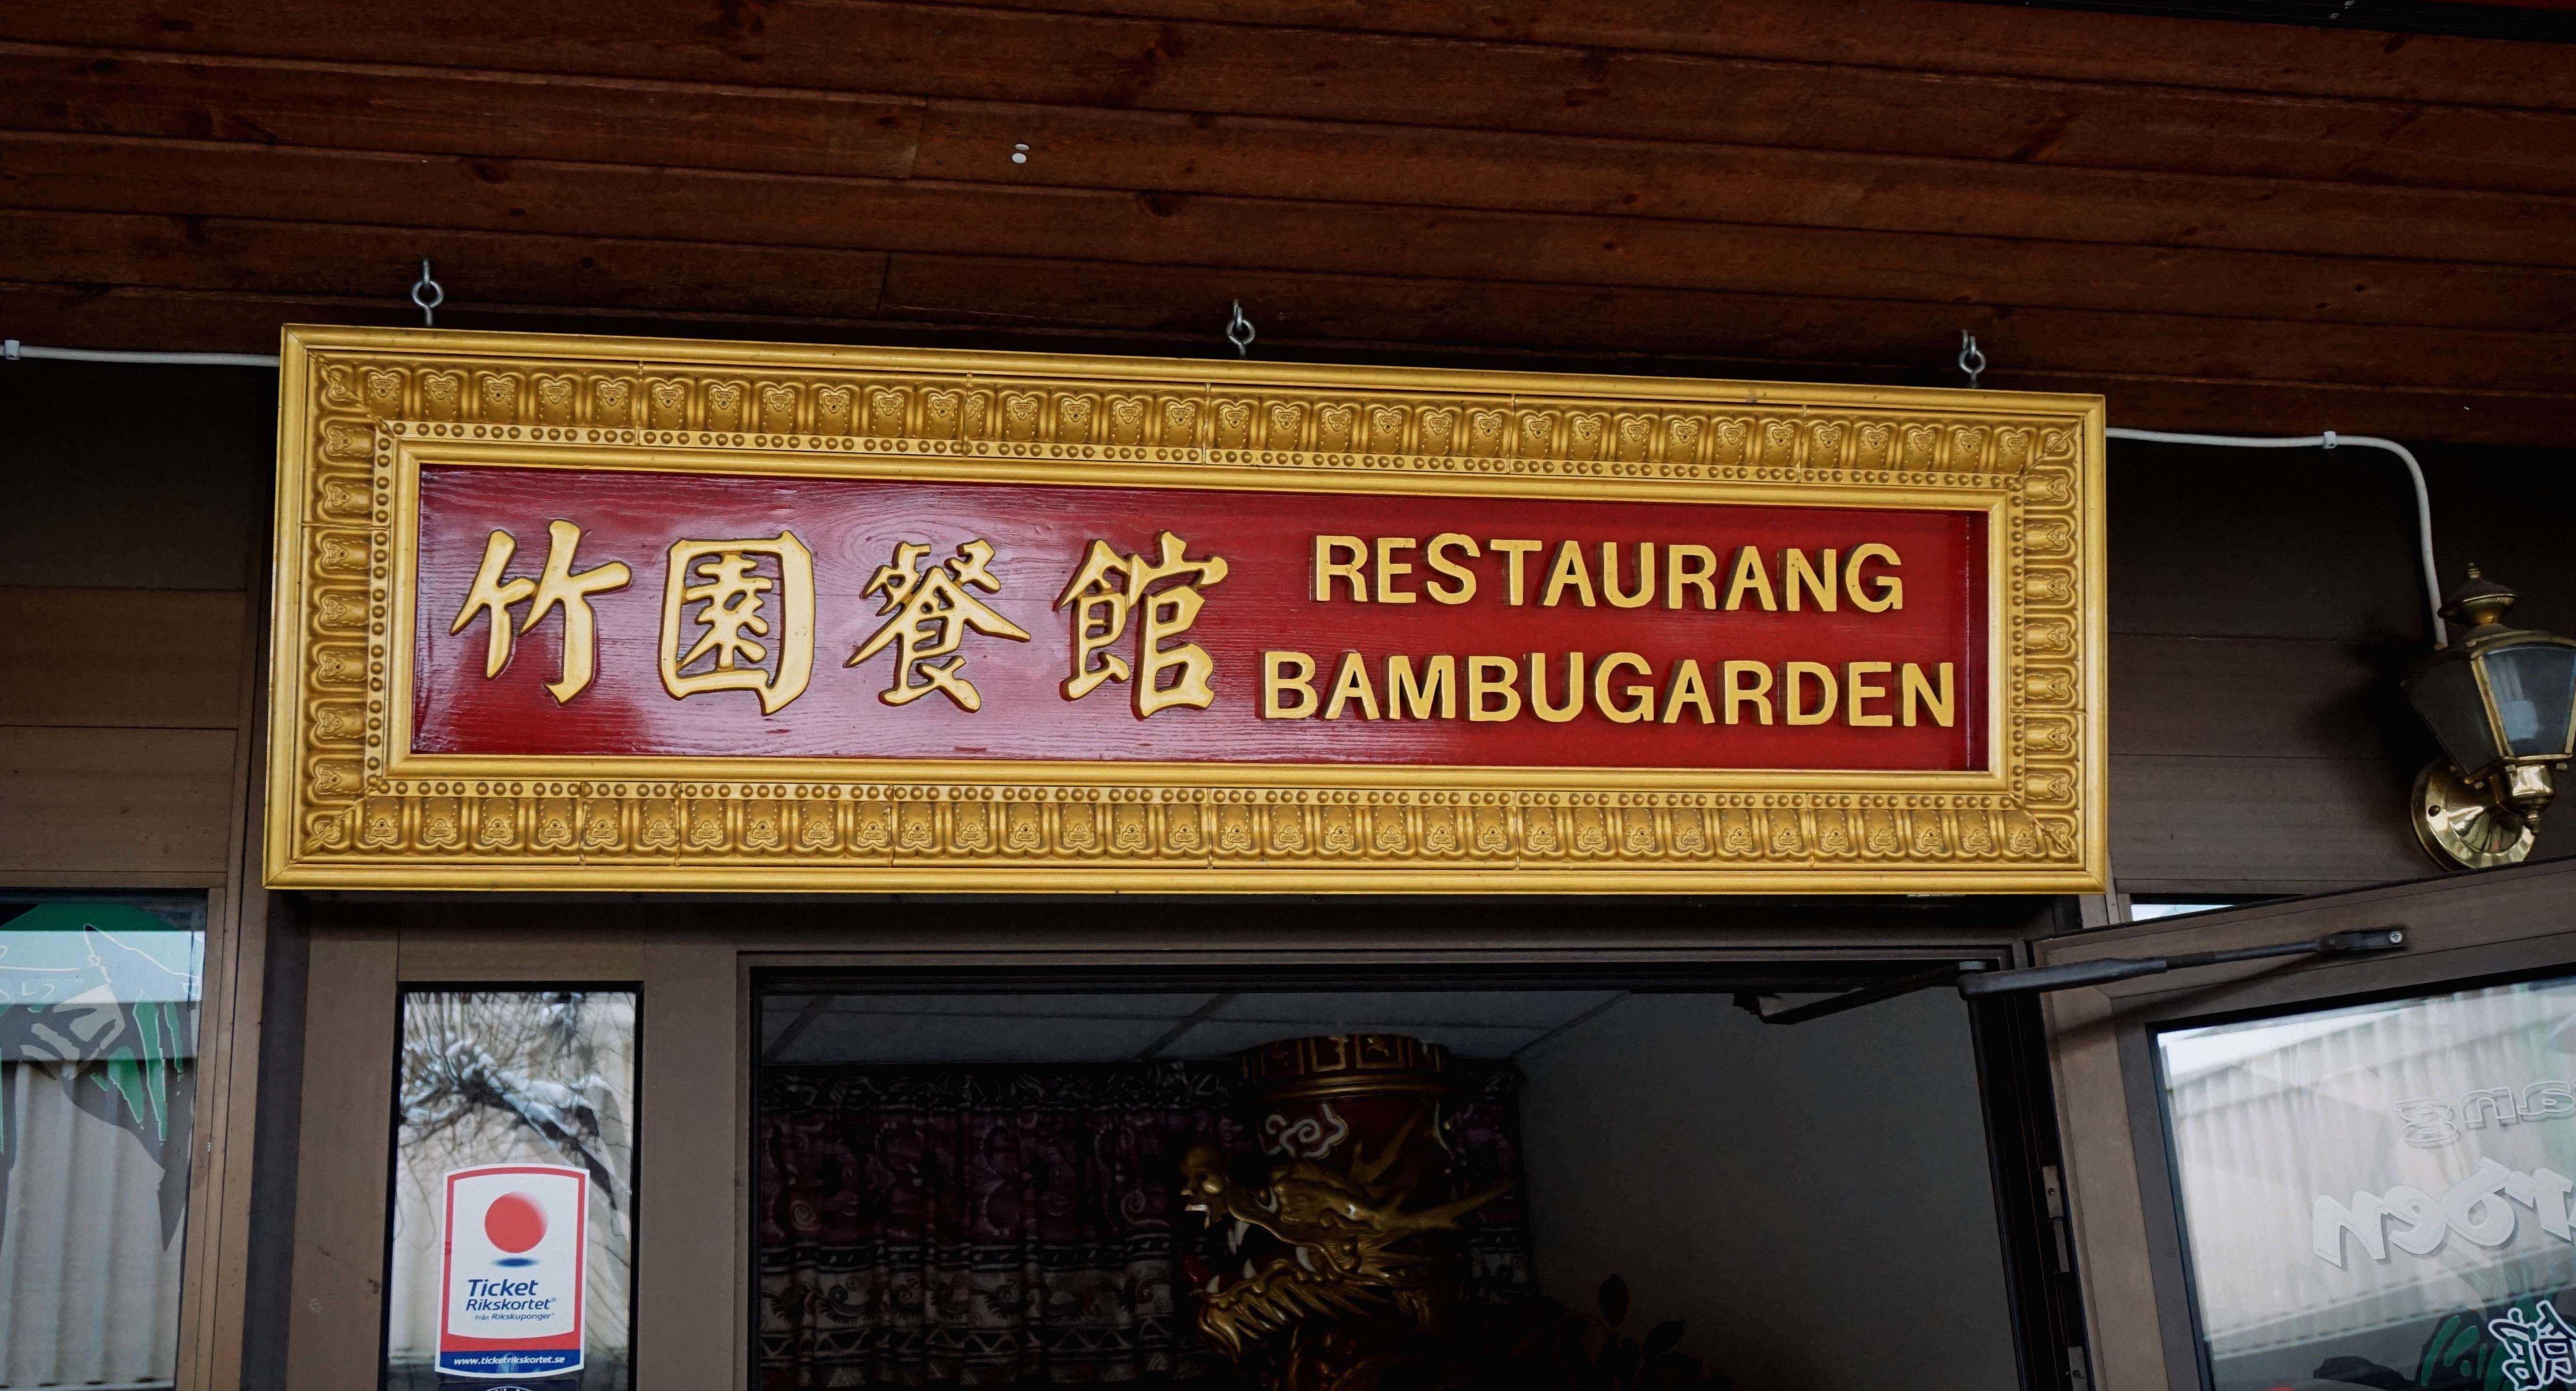 Jennie Andersson, Restaurang Bambugården